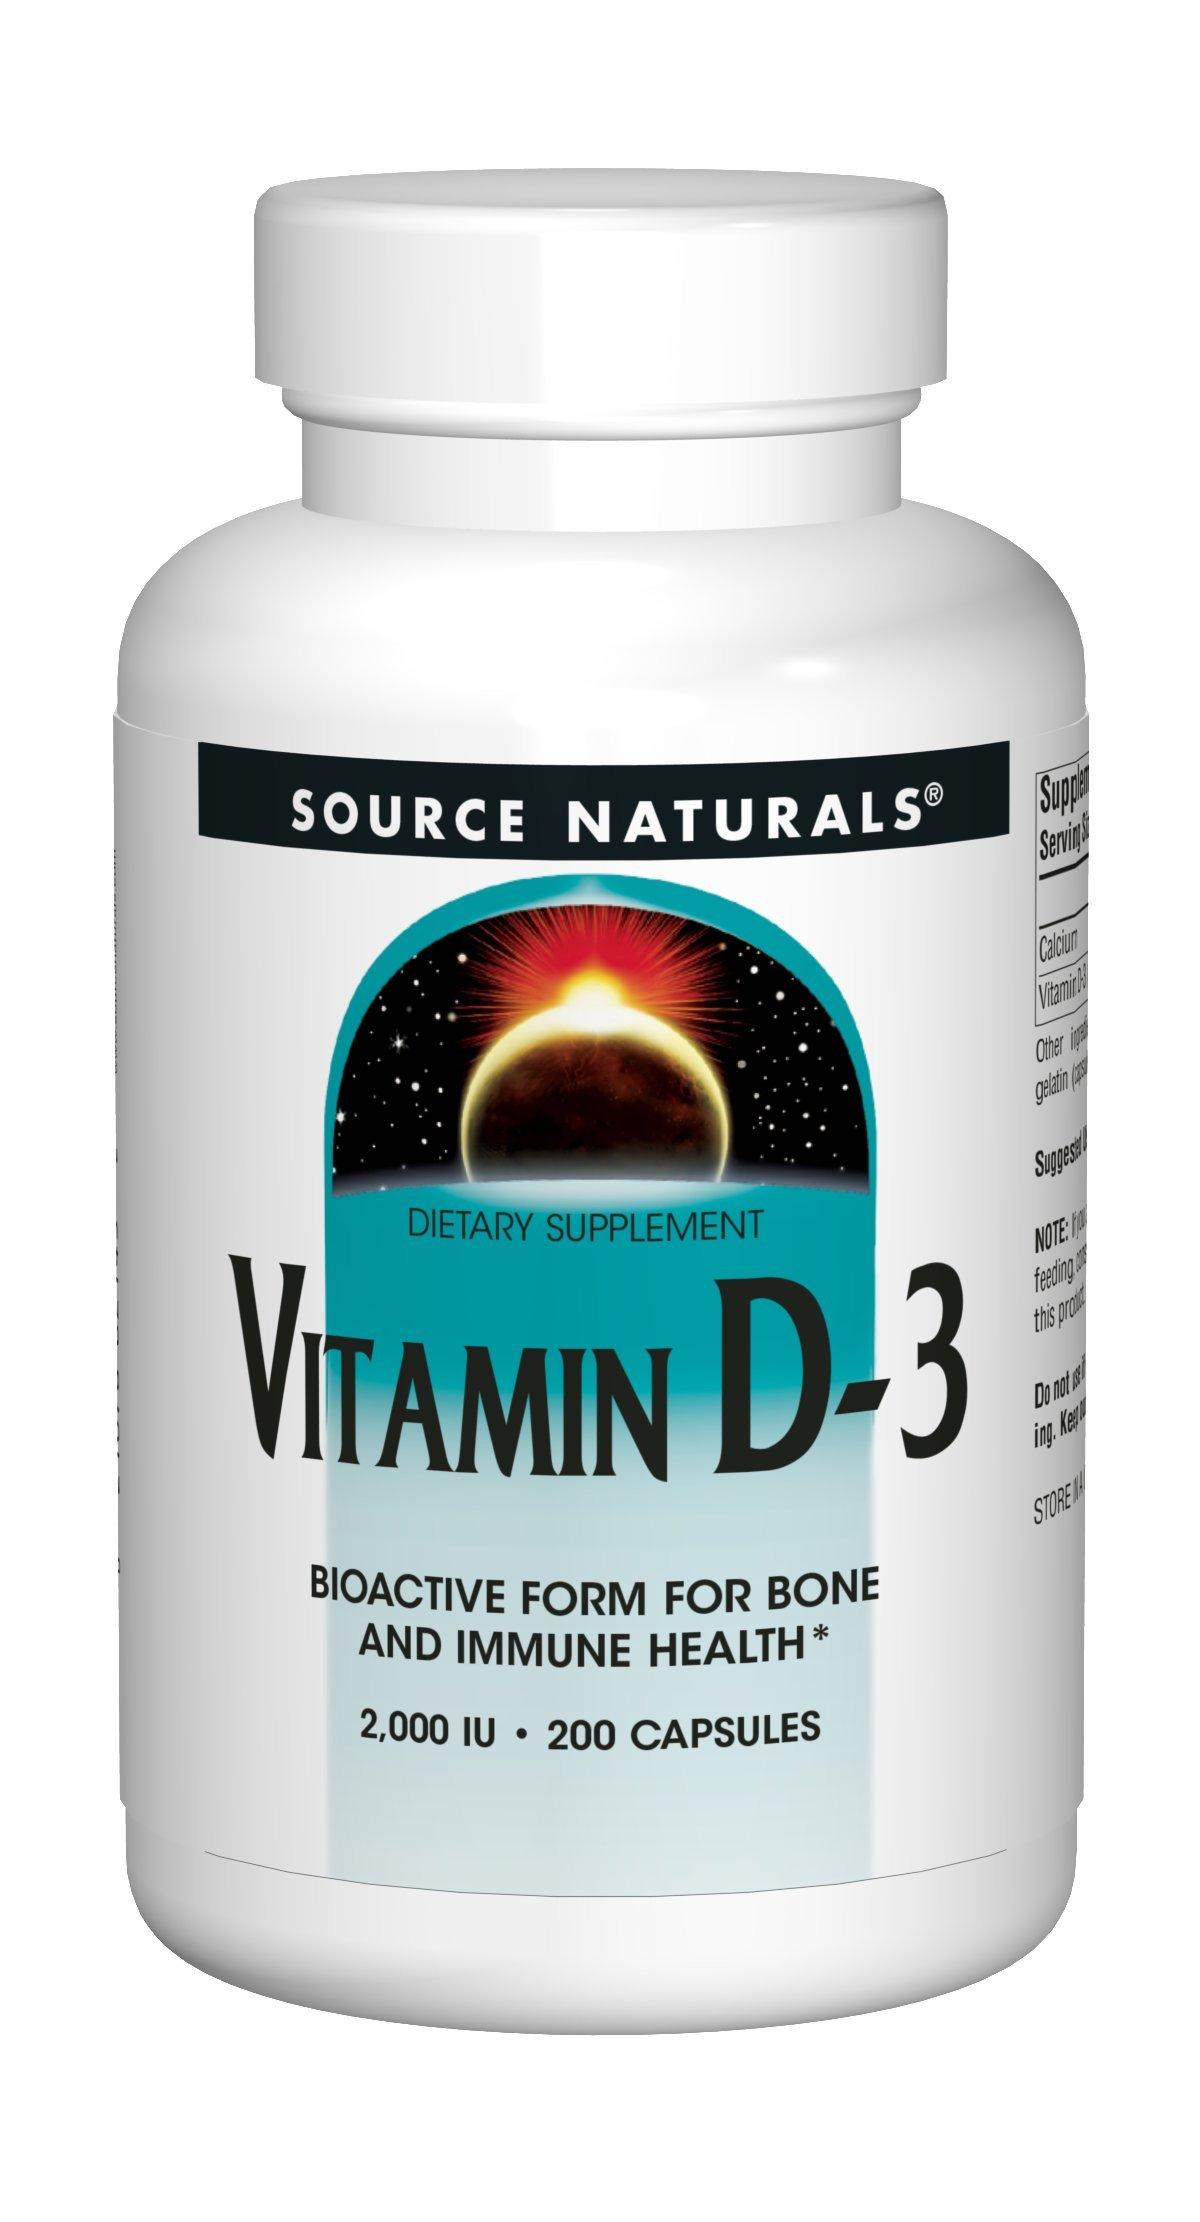 Source Naturals Vitamin D-3 2000IU - 200 Capsules